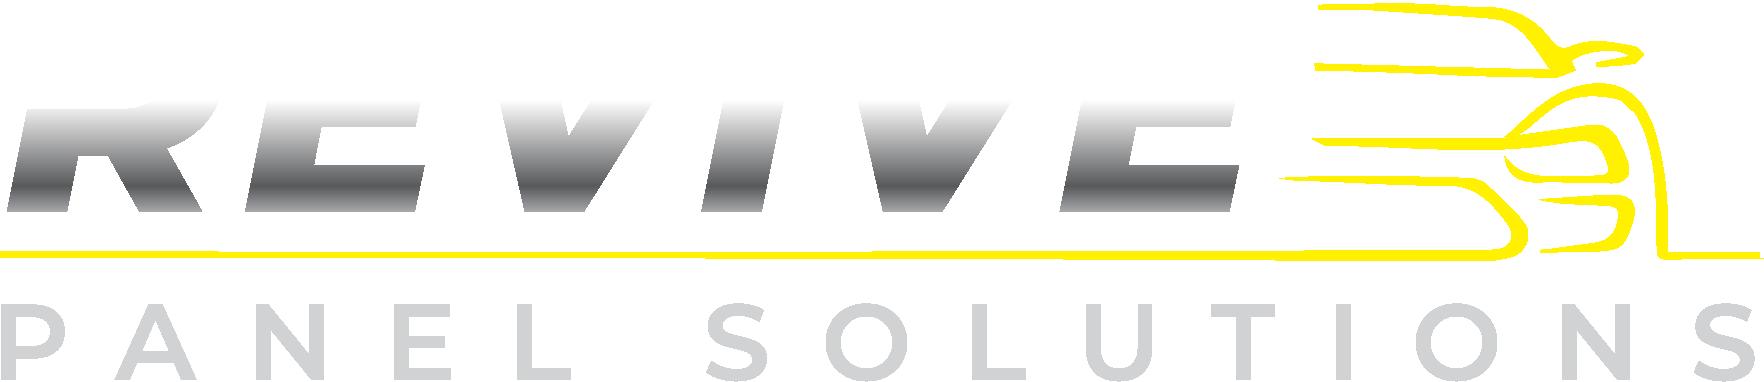 Revive Panels logo